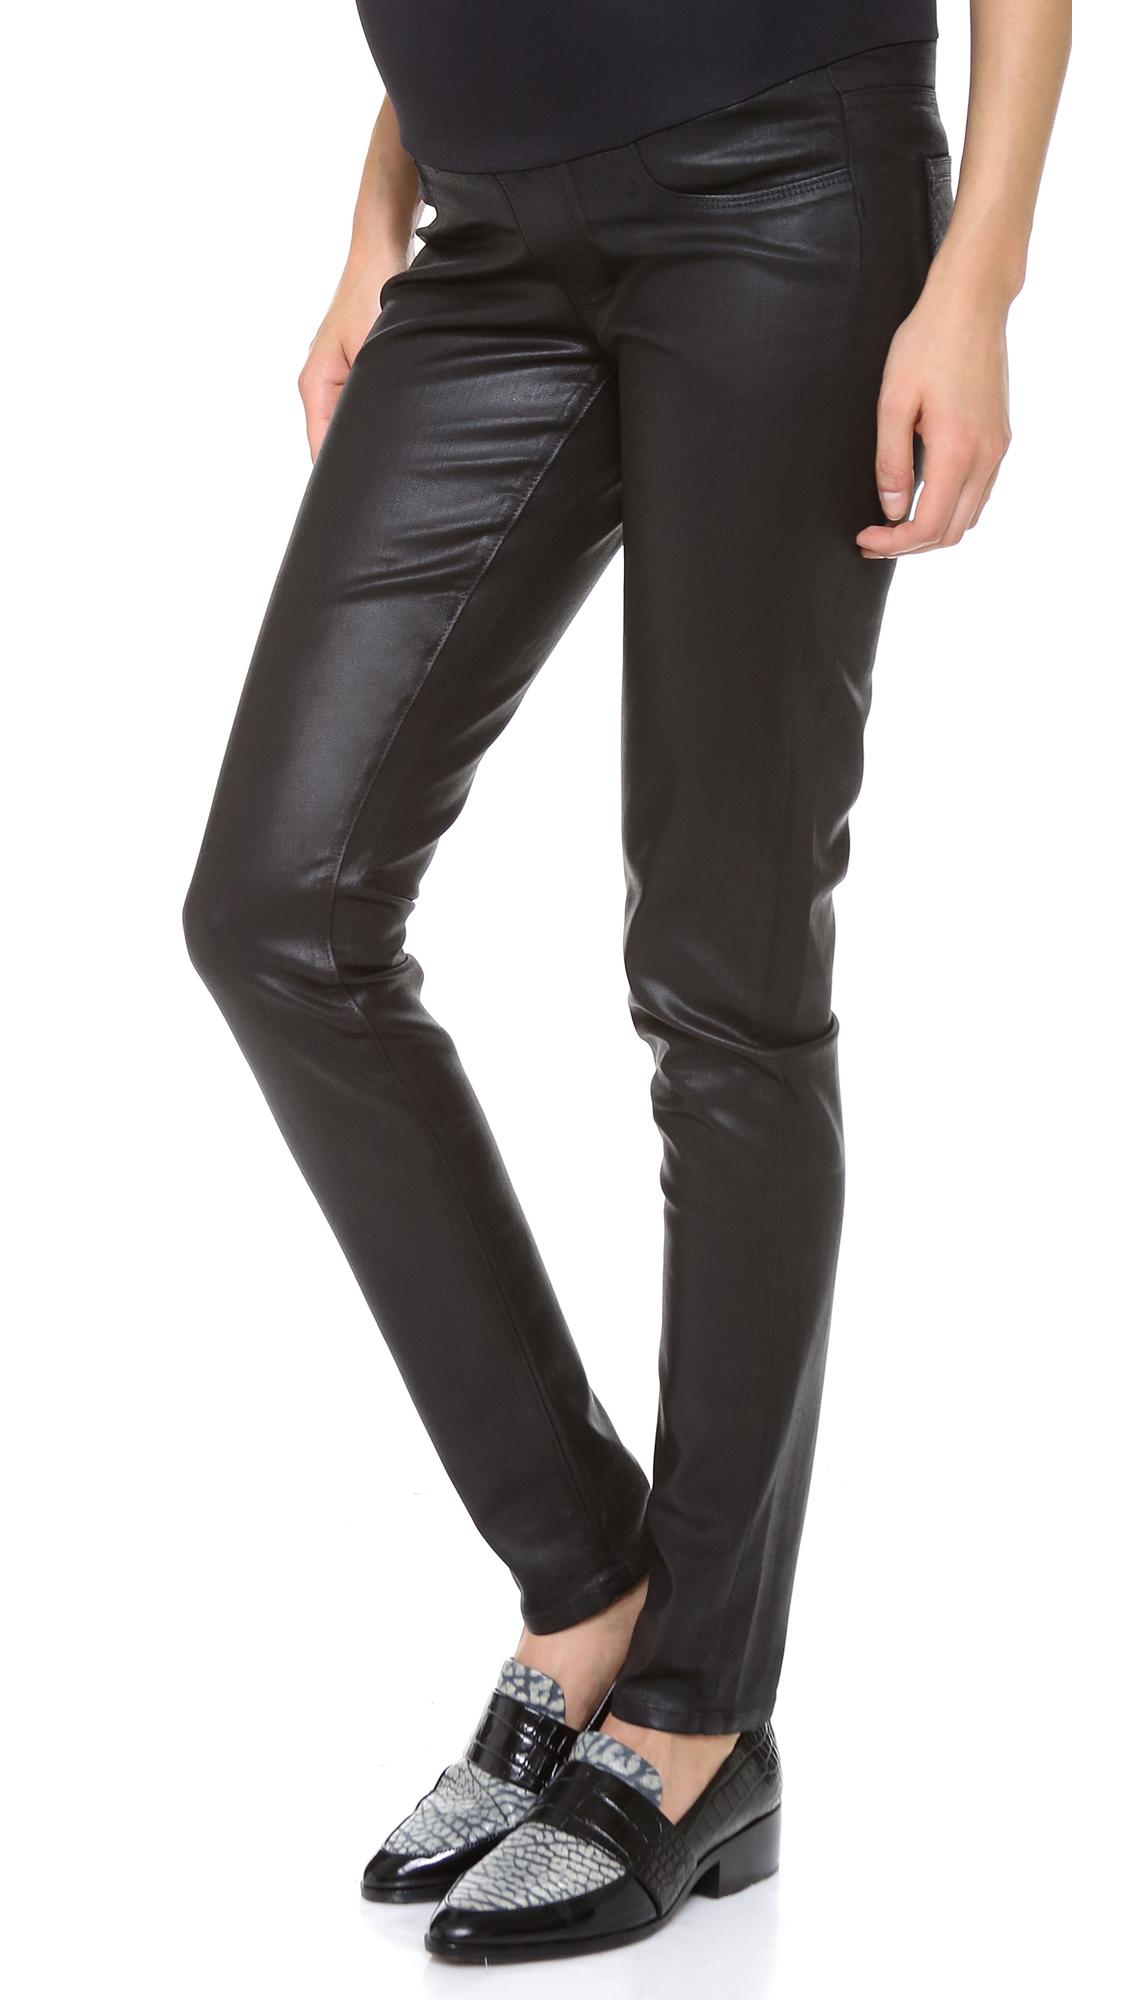 Womens Coated Skinny Jeans